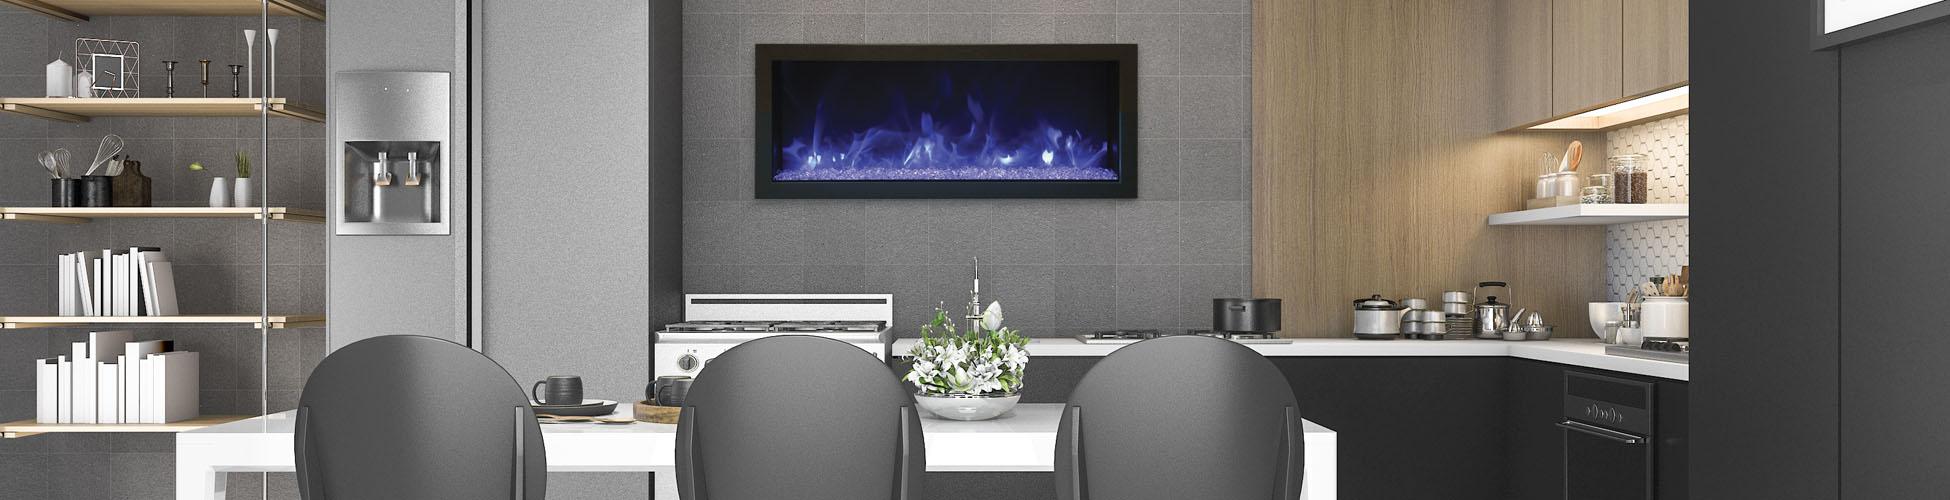 BI-XS-40 electric fireplace